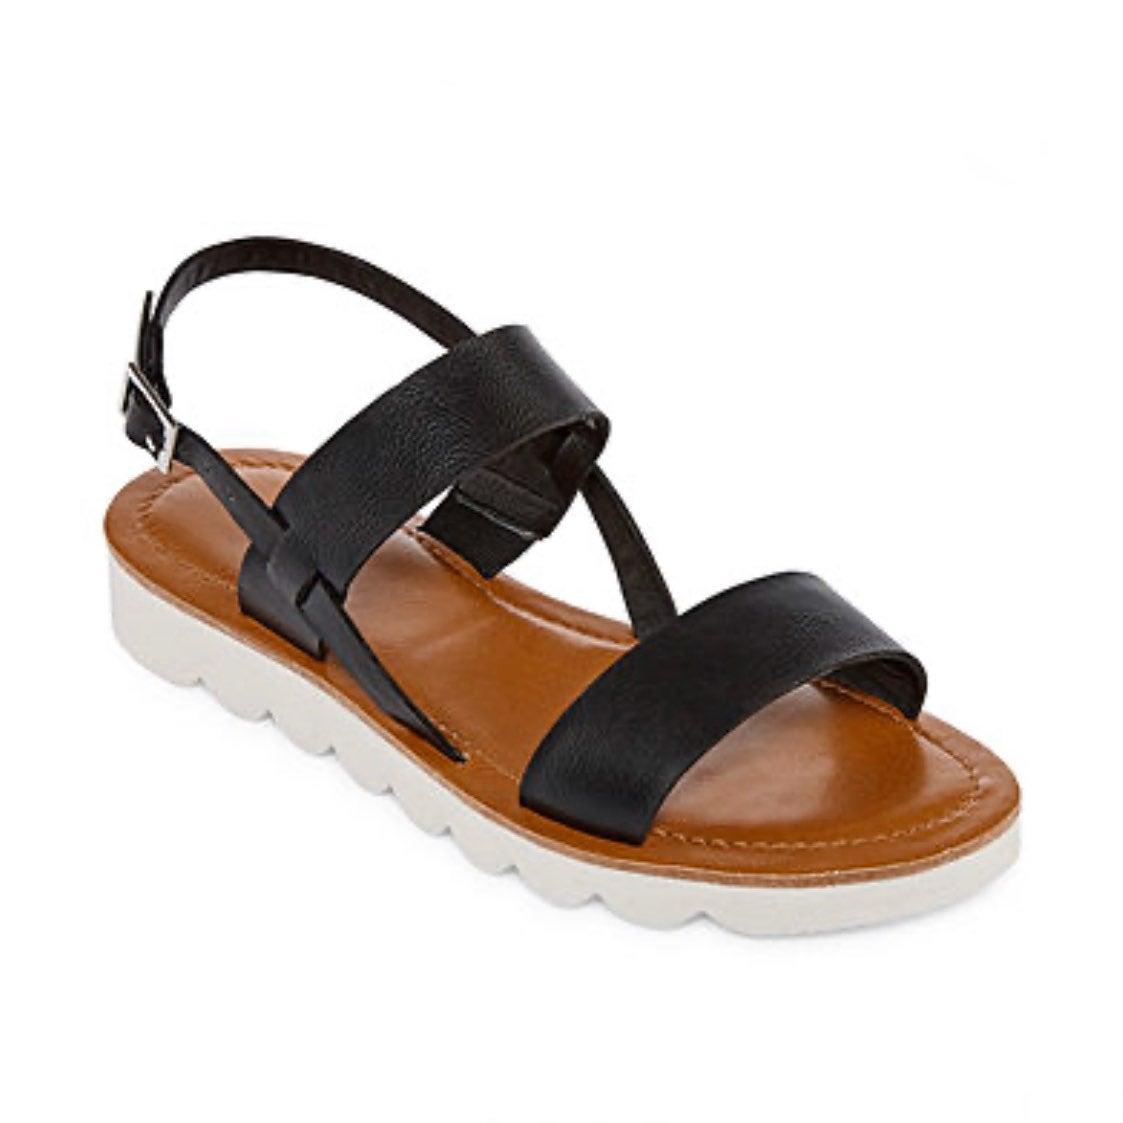 New Arizona Black Strap Sandals